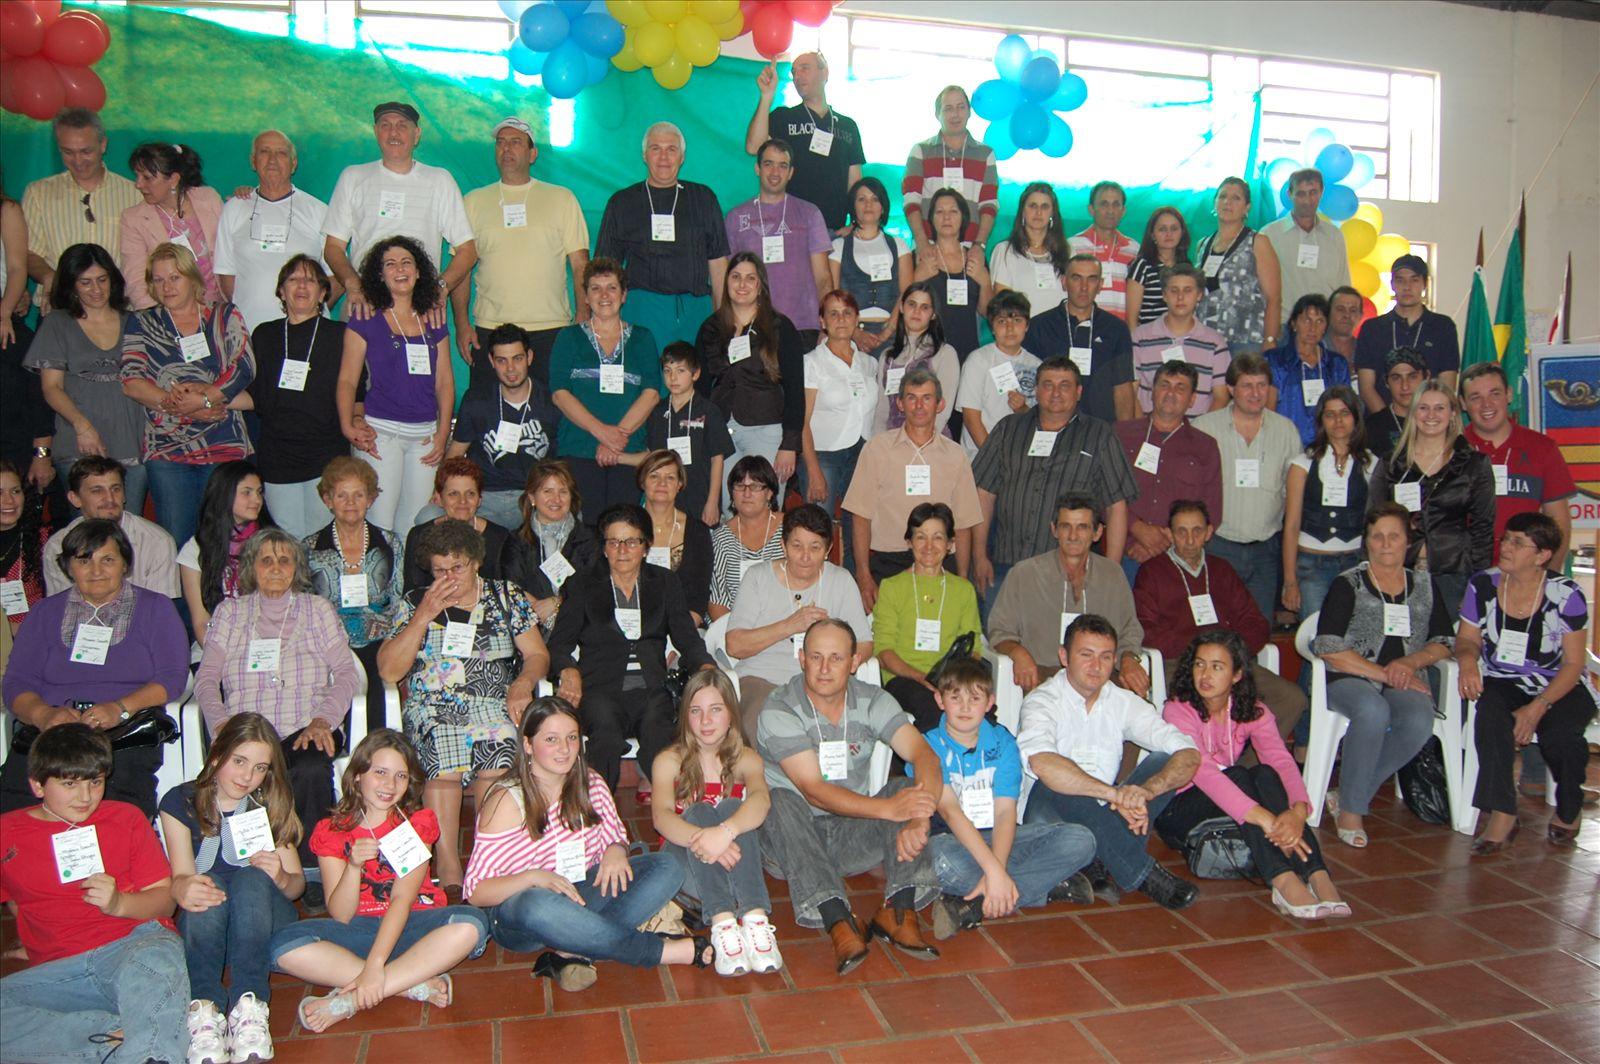 2º Encontro Família Cornelli - 11.10.2009 (163)_0